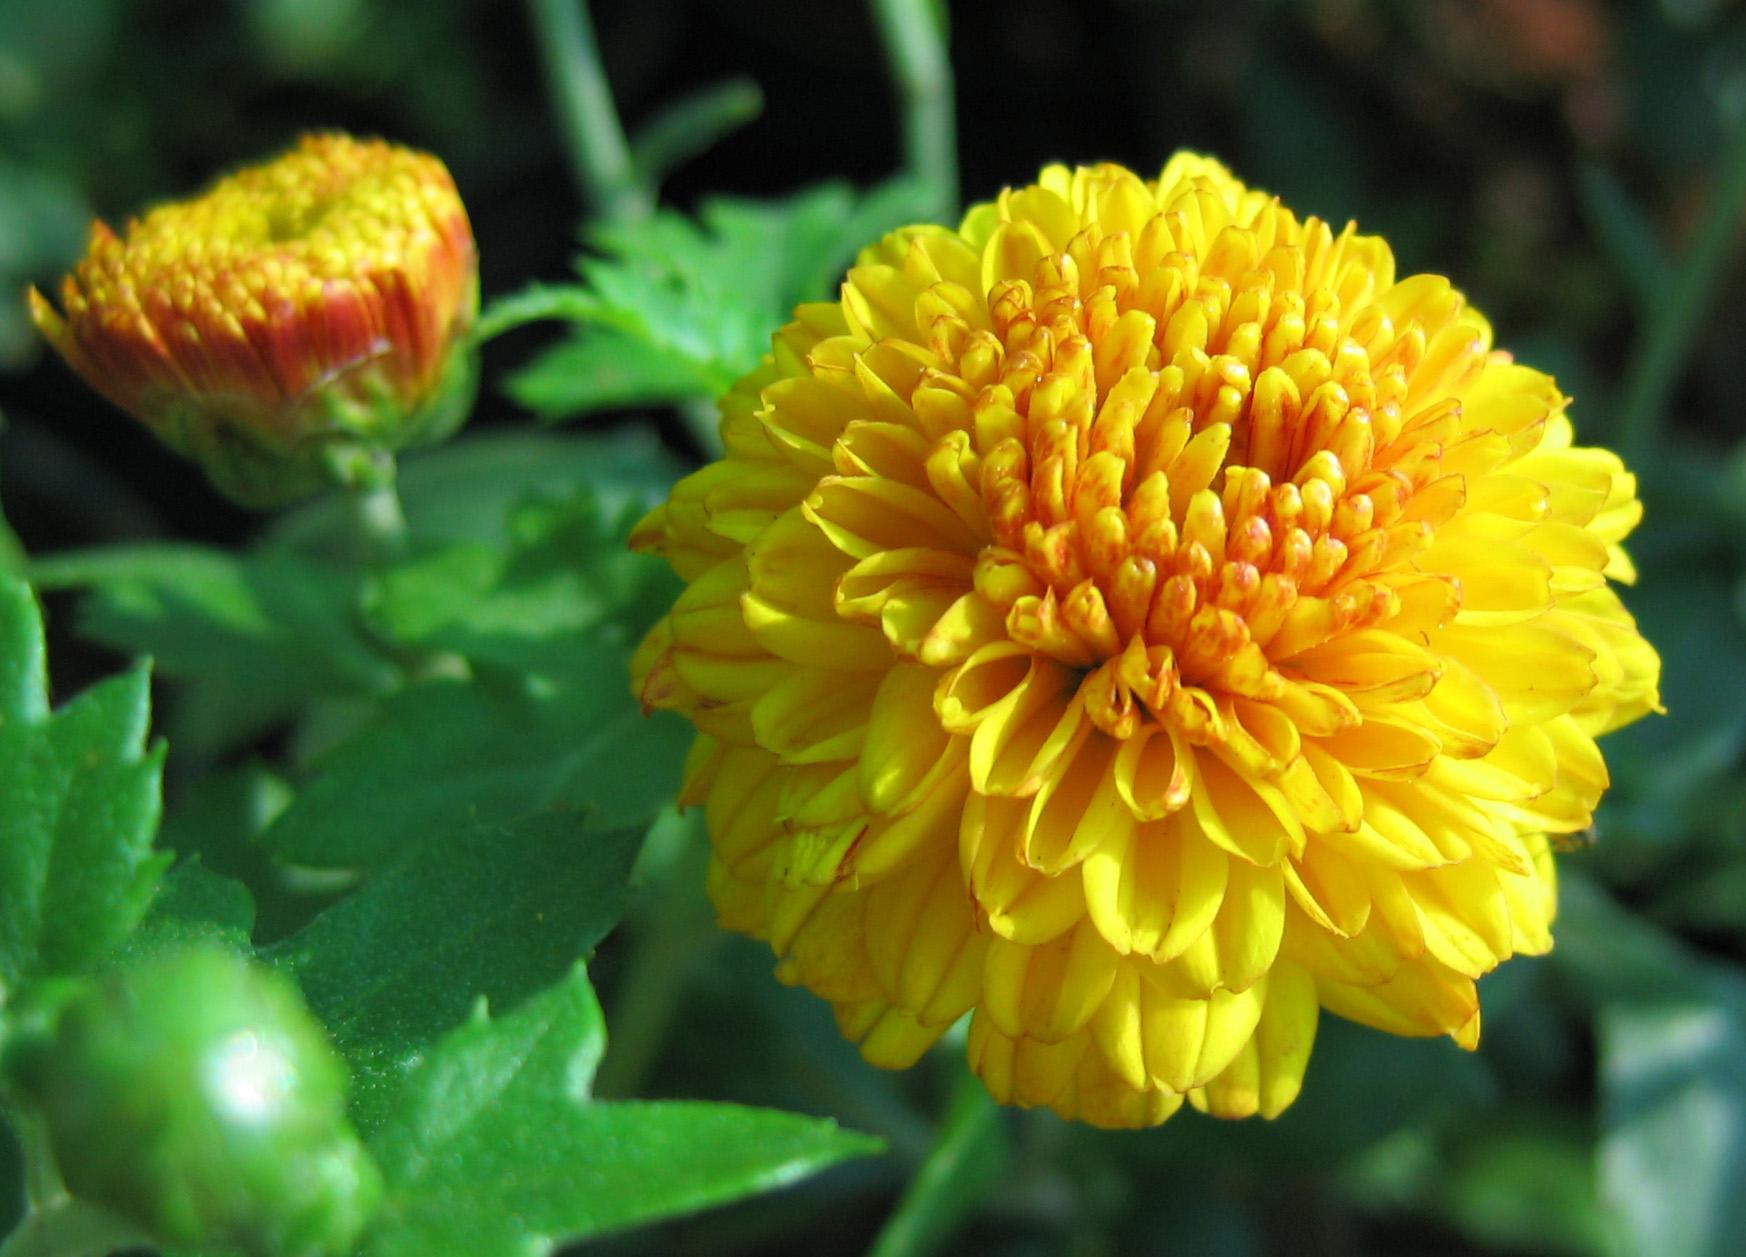 Fileyellow Flowers 3g Wikimedia Commons